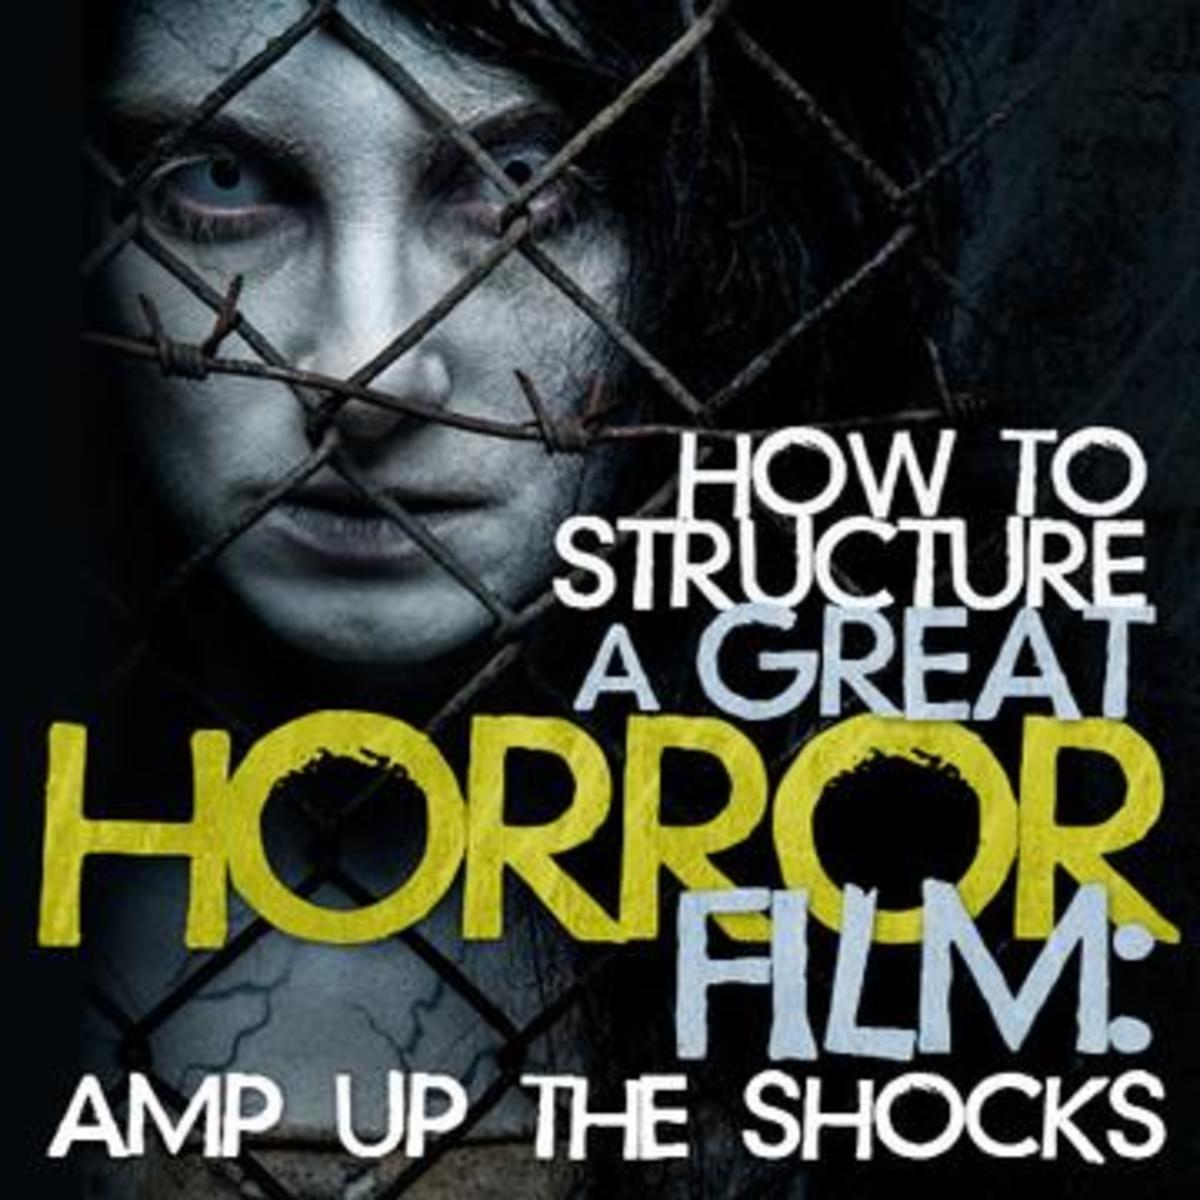 ws_horrorfilm-500_360x